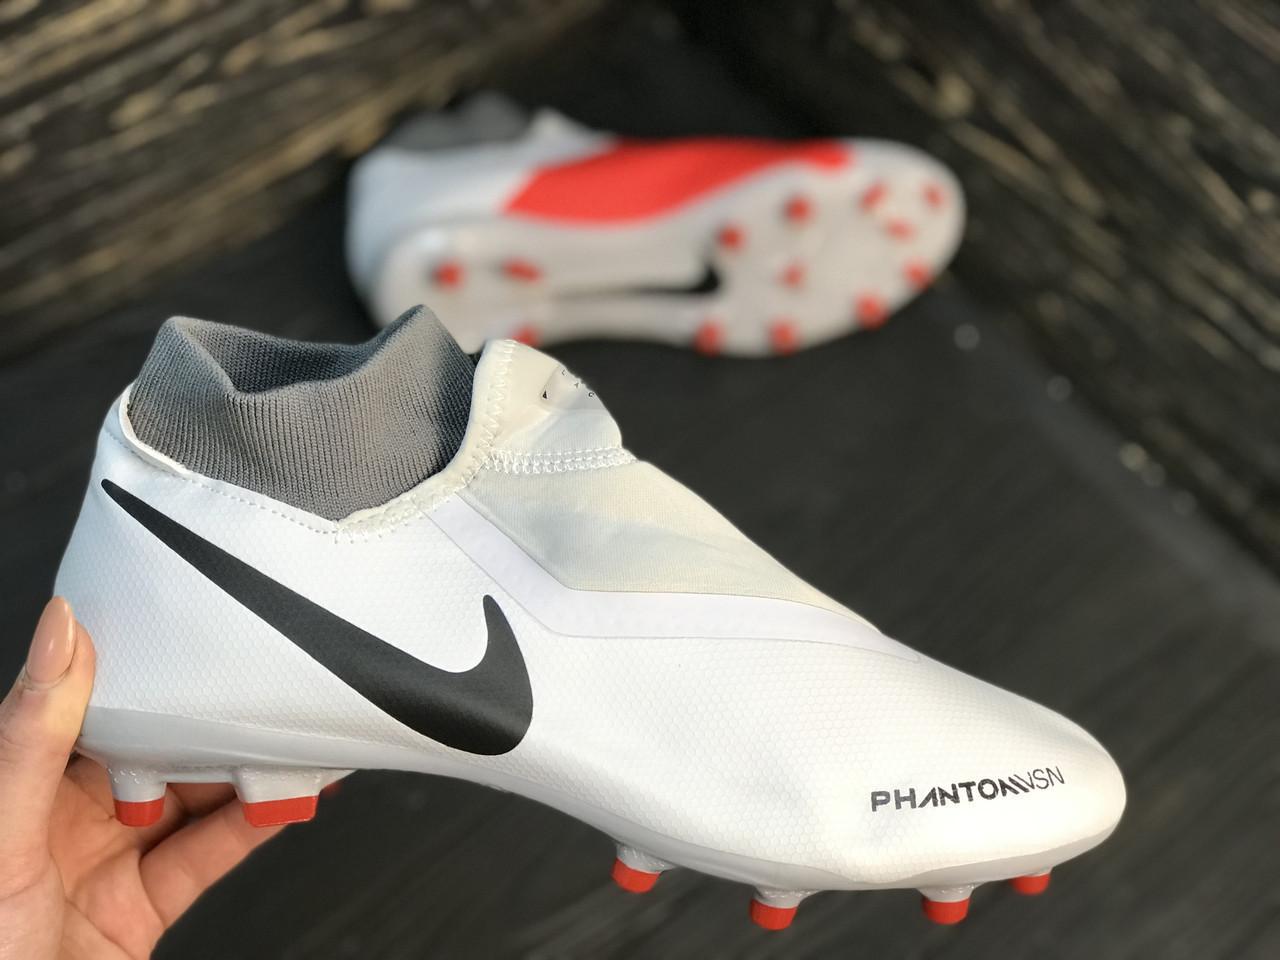 7f9e3903 Бутсы Nike Phantom VSN FG /найк фантом #O/T, цена 1 220 грн., купить ...